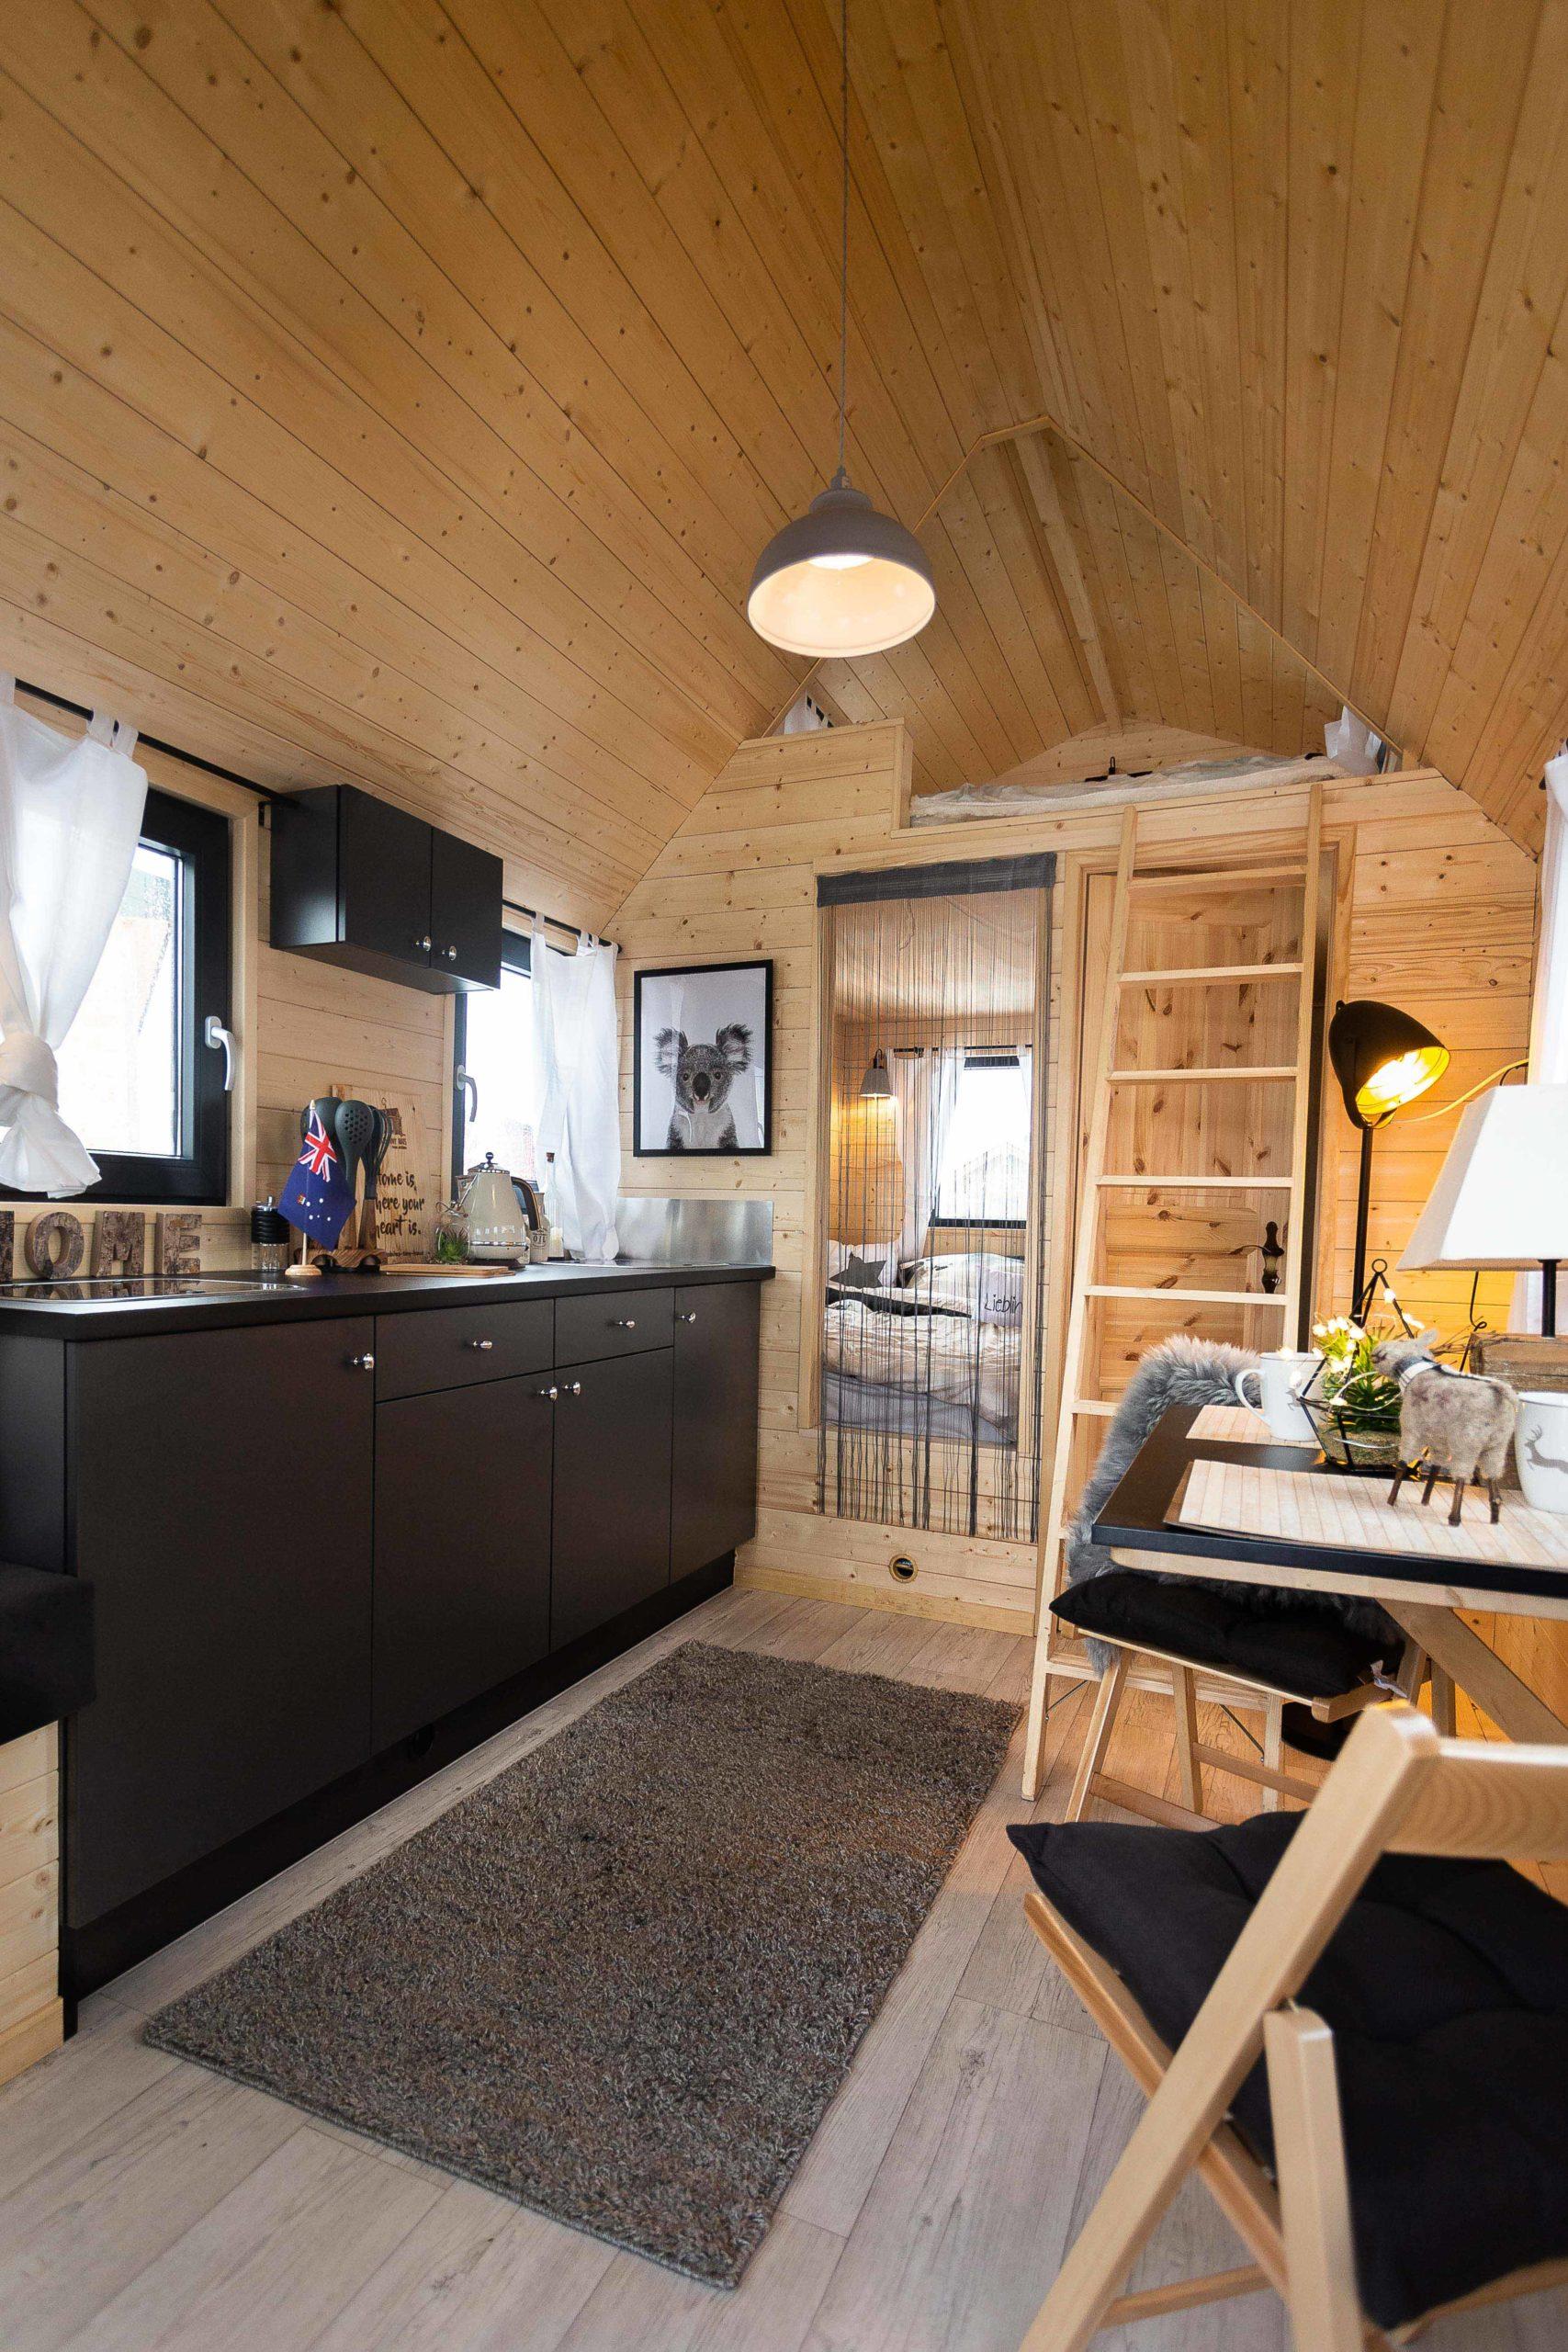 mobiles-tiny-house-australien-vital-camp-gmbh-03